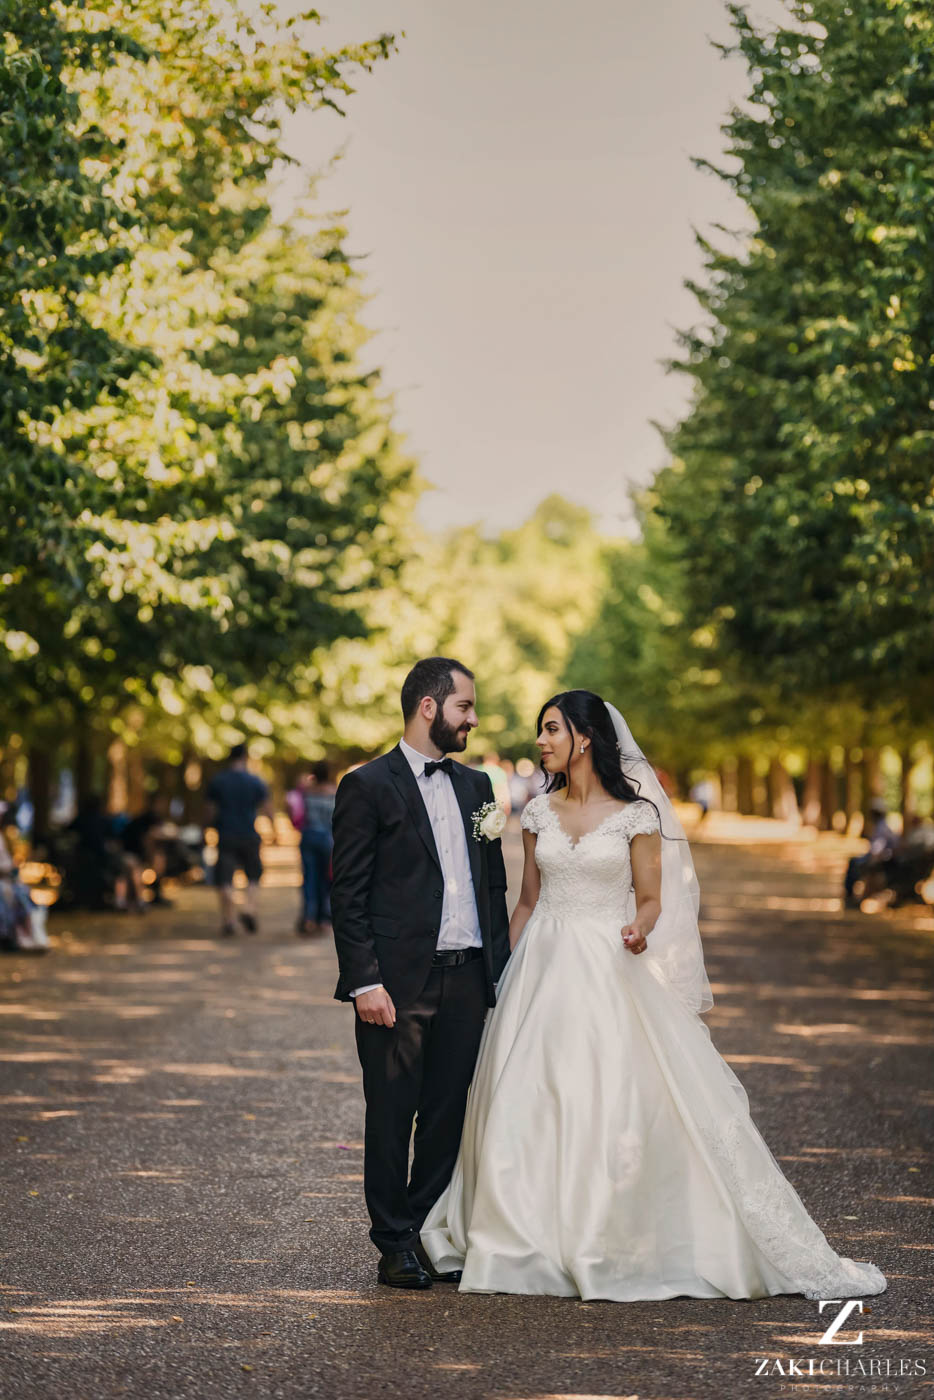 Wedding photography at Marriott Hotel Regents Park